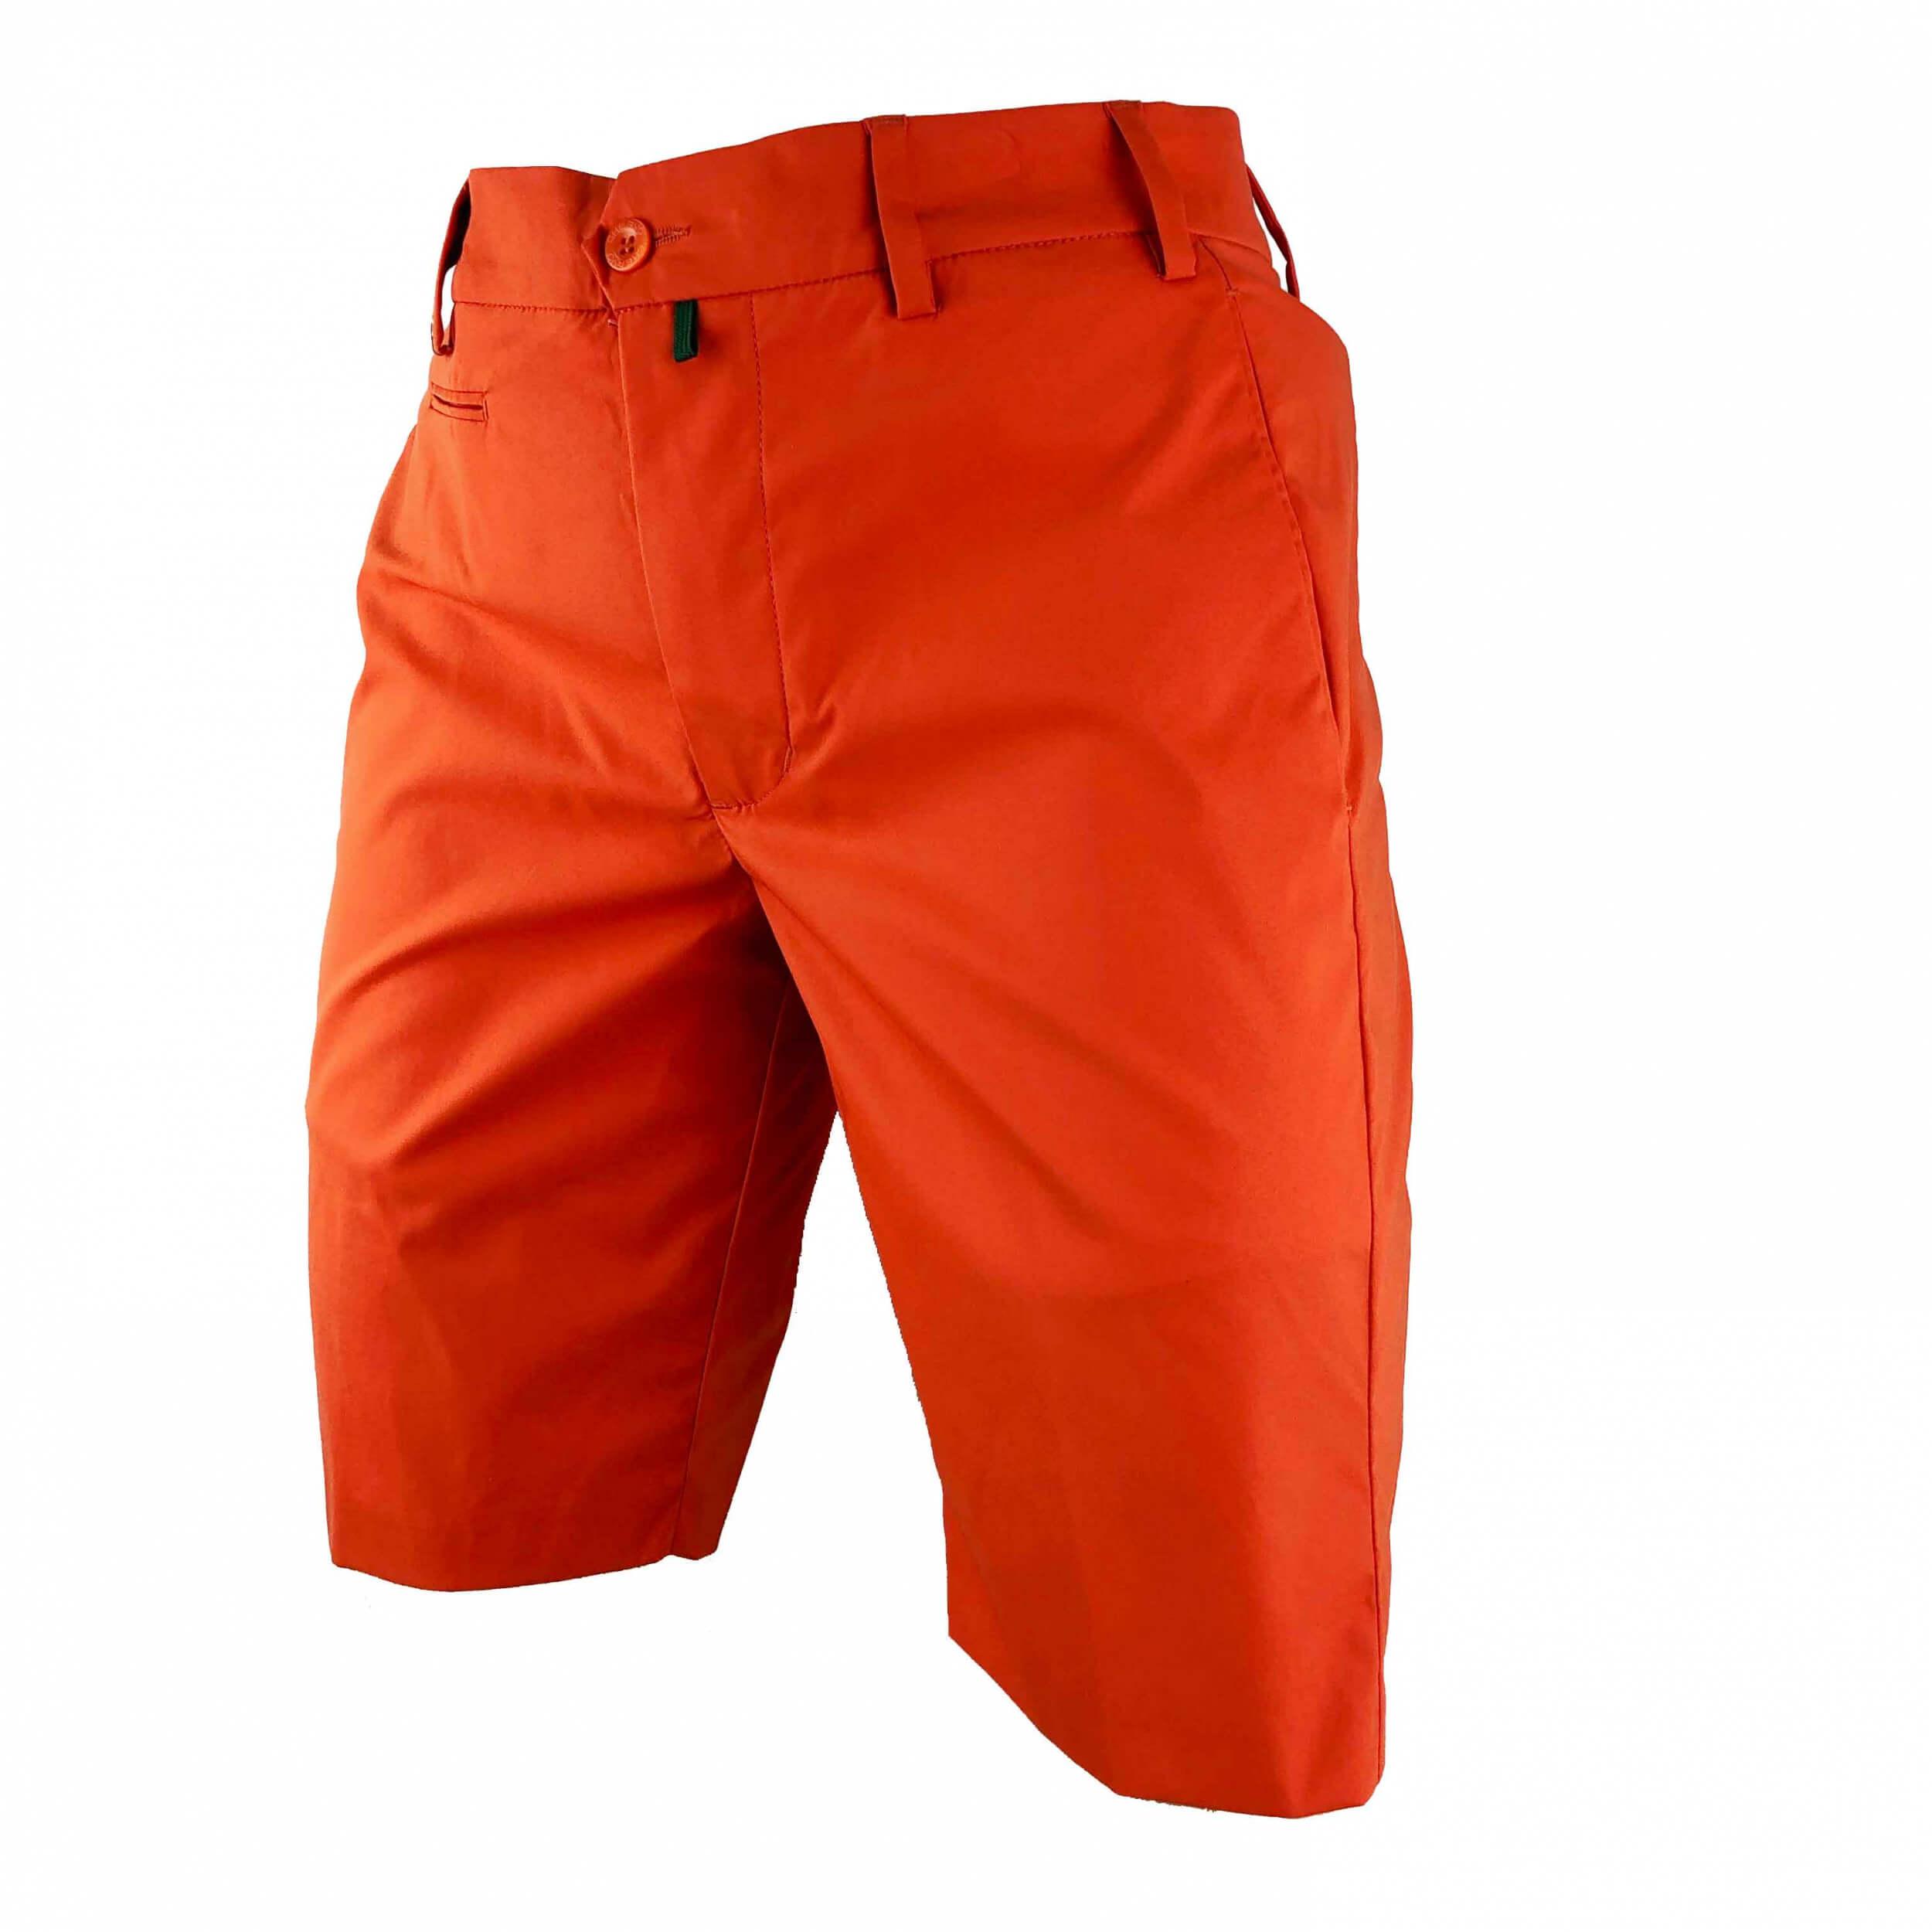 Chervo Herren Short Garcia DRY MATIC plasmatic 356 orange